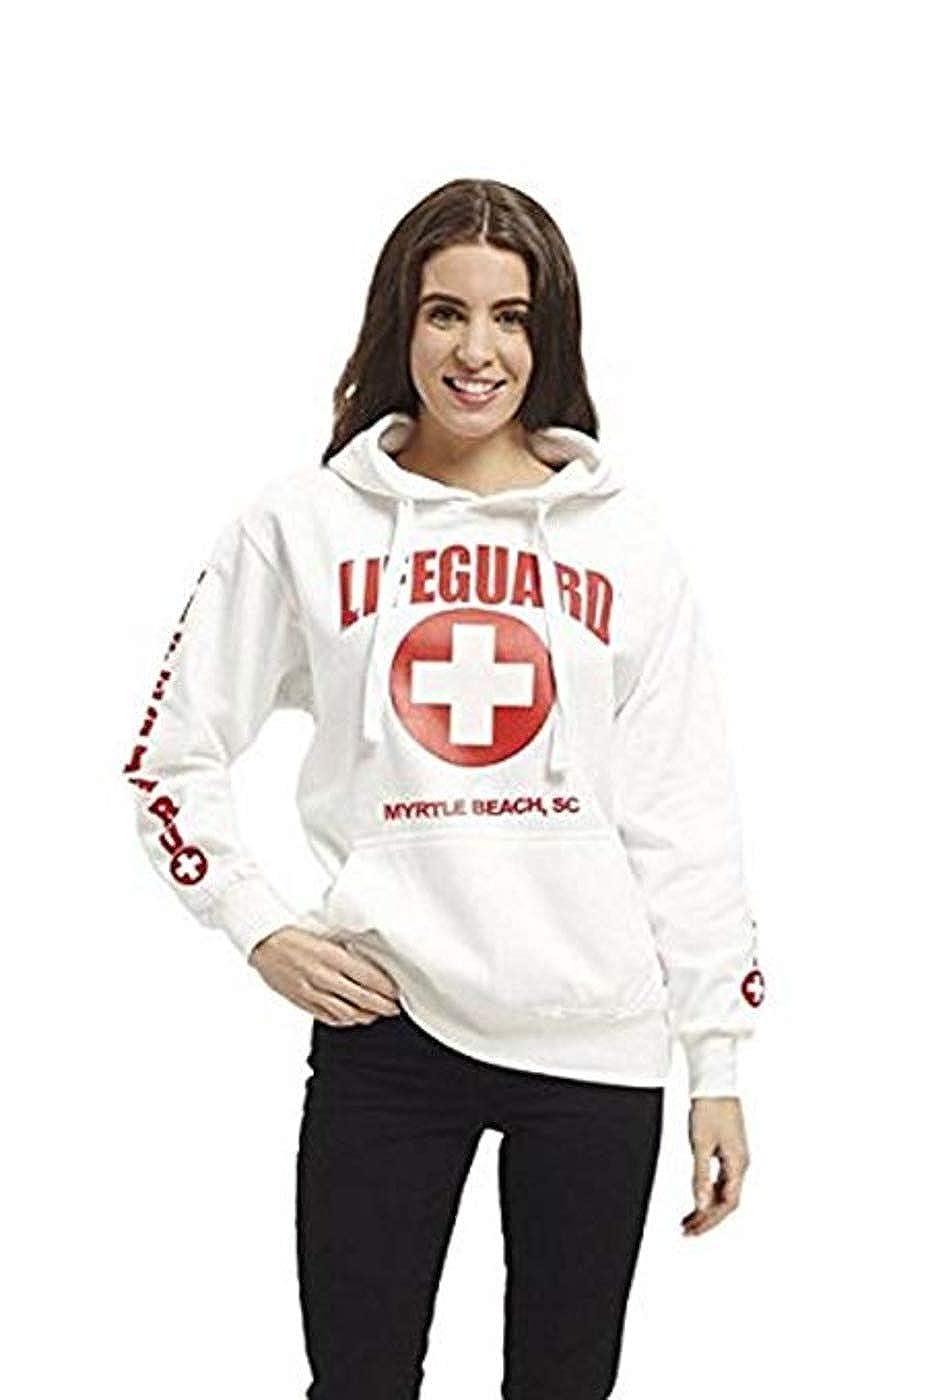 198c0825b9b1 Lifeguard official ladies myrtle beach hoodie sports outdoors jpg 926x1400 Lifeguard  sweatshirt myrtle beach